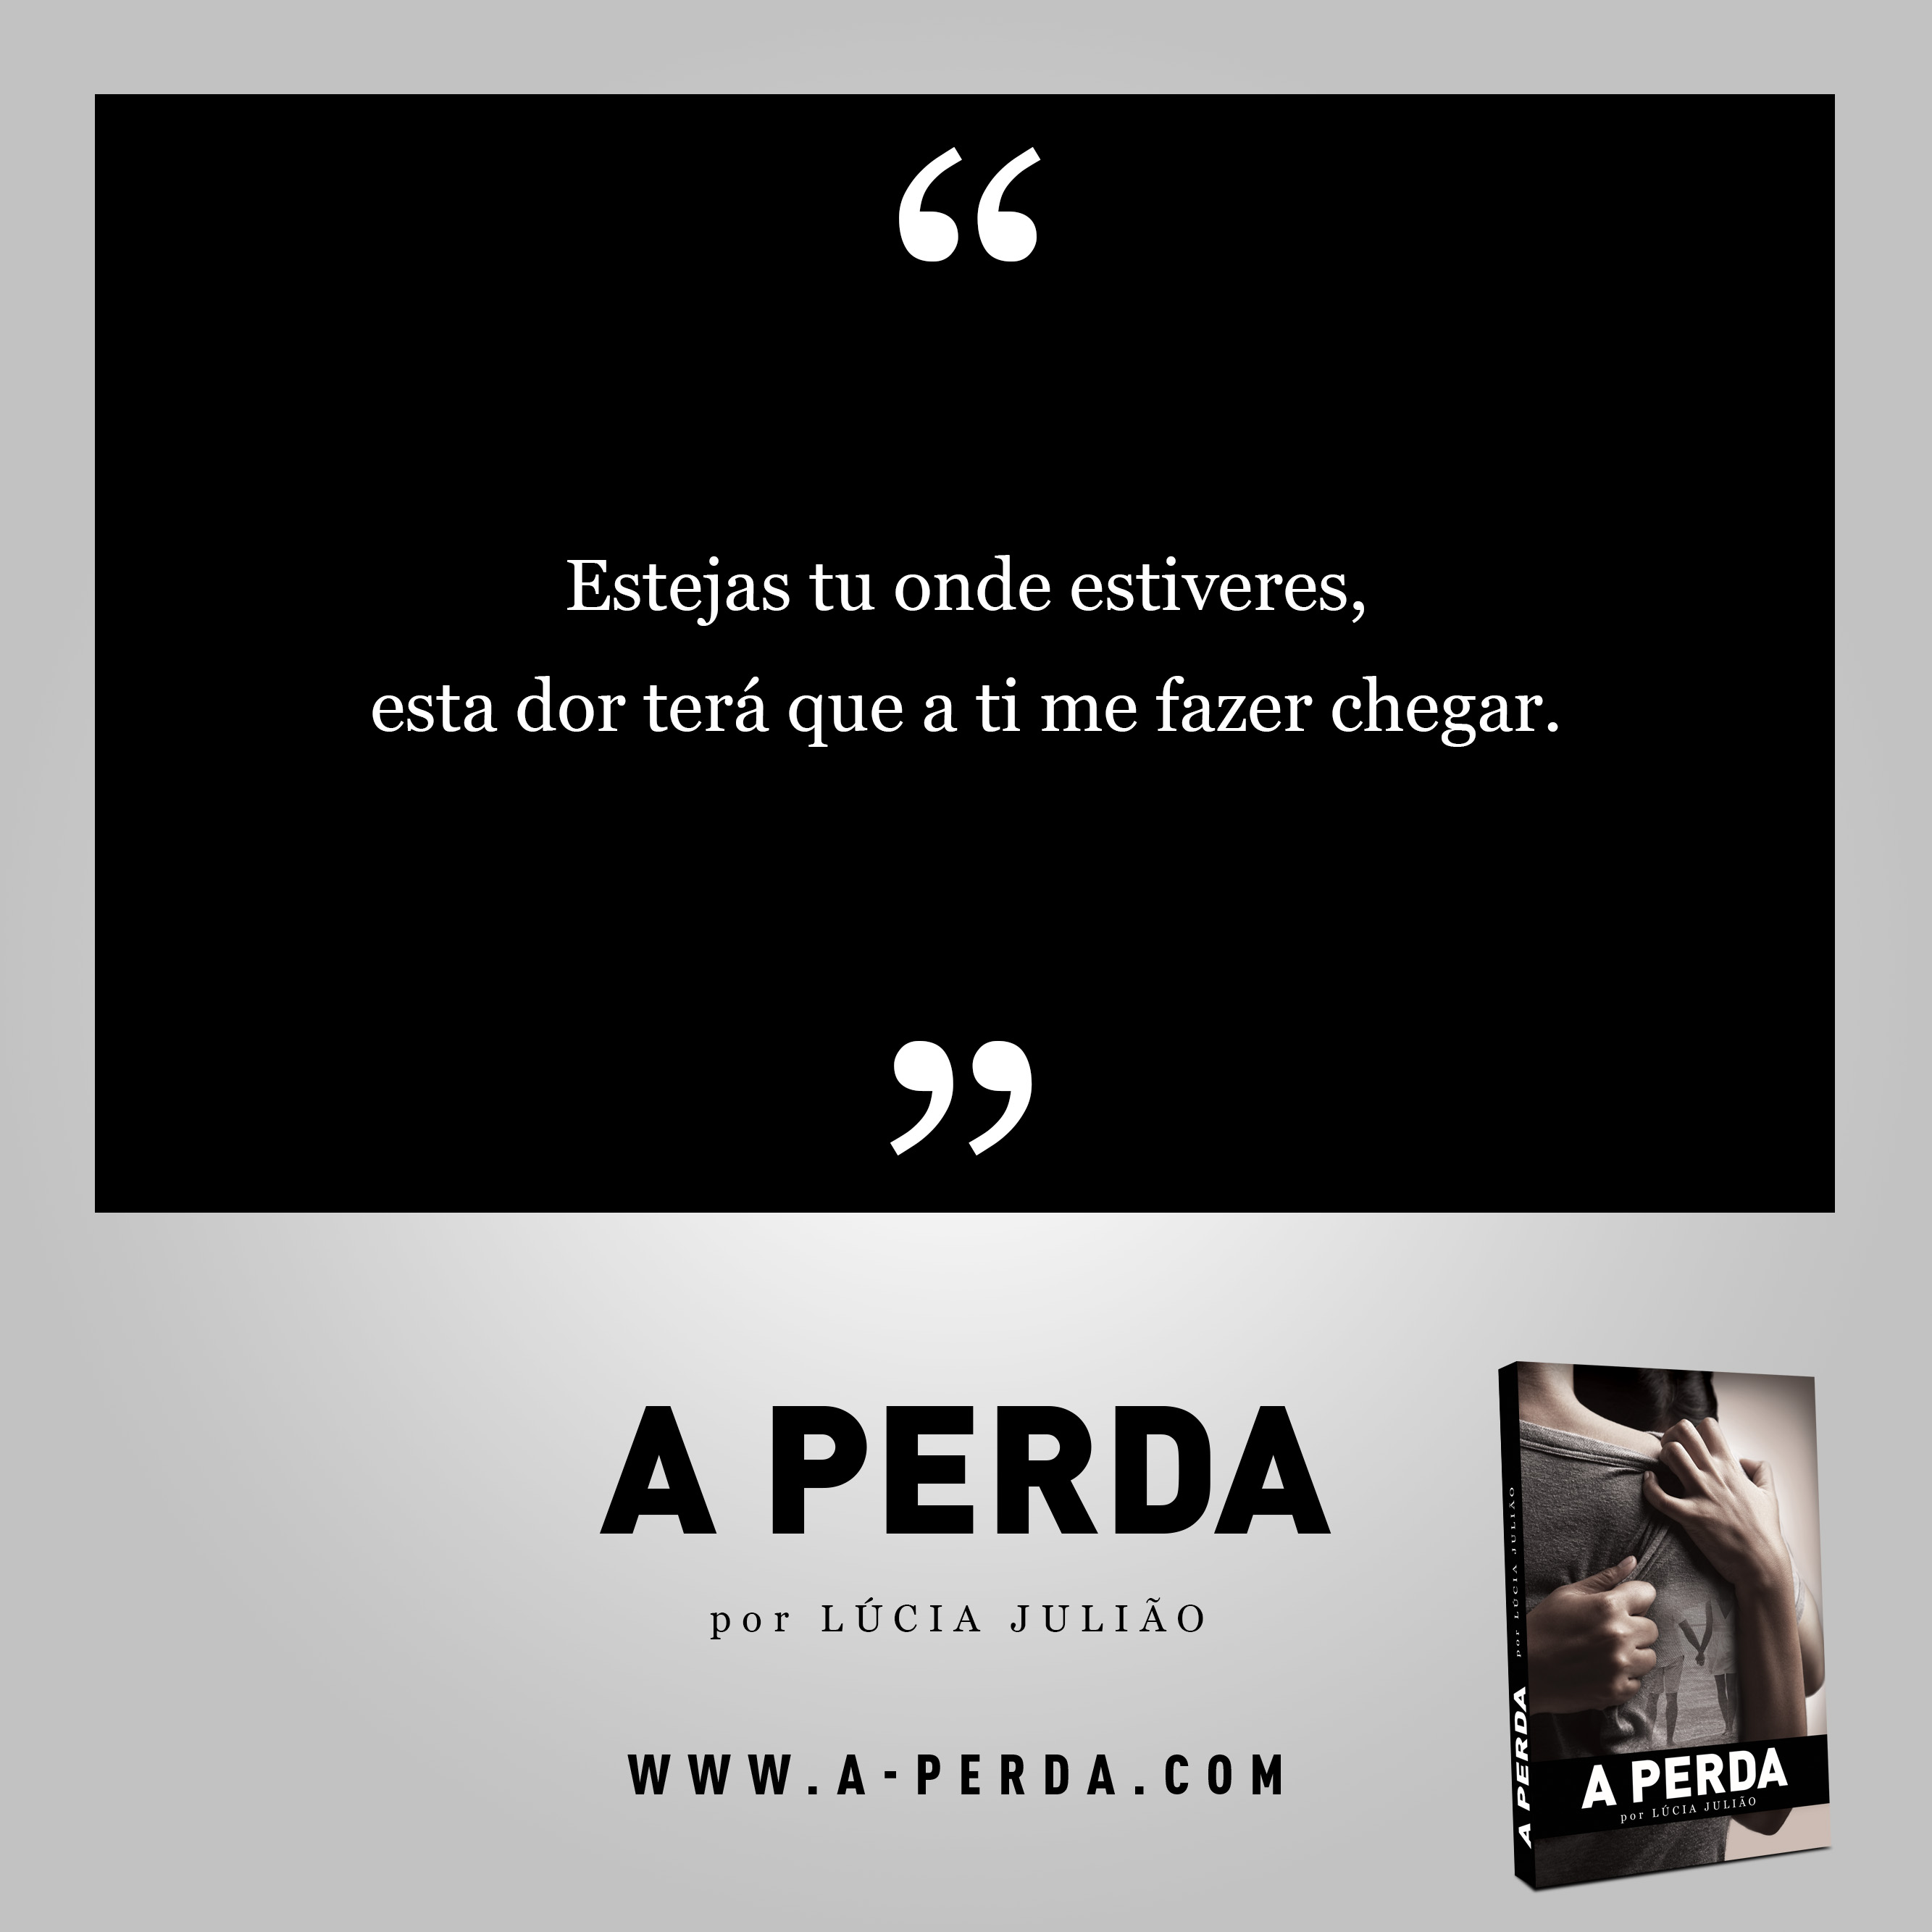 011-capitulo-46-livro-a-Perda-de-Lucia-Juliao-Instagram